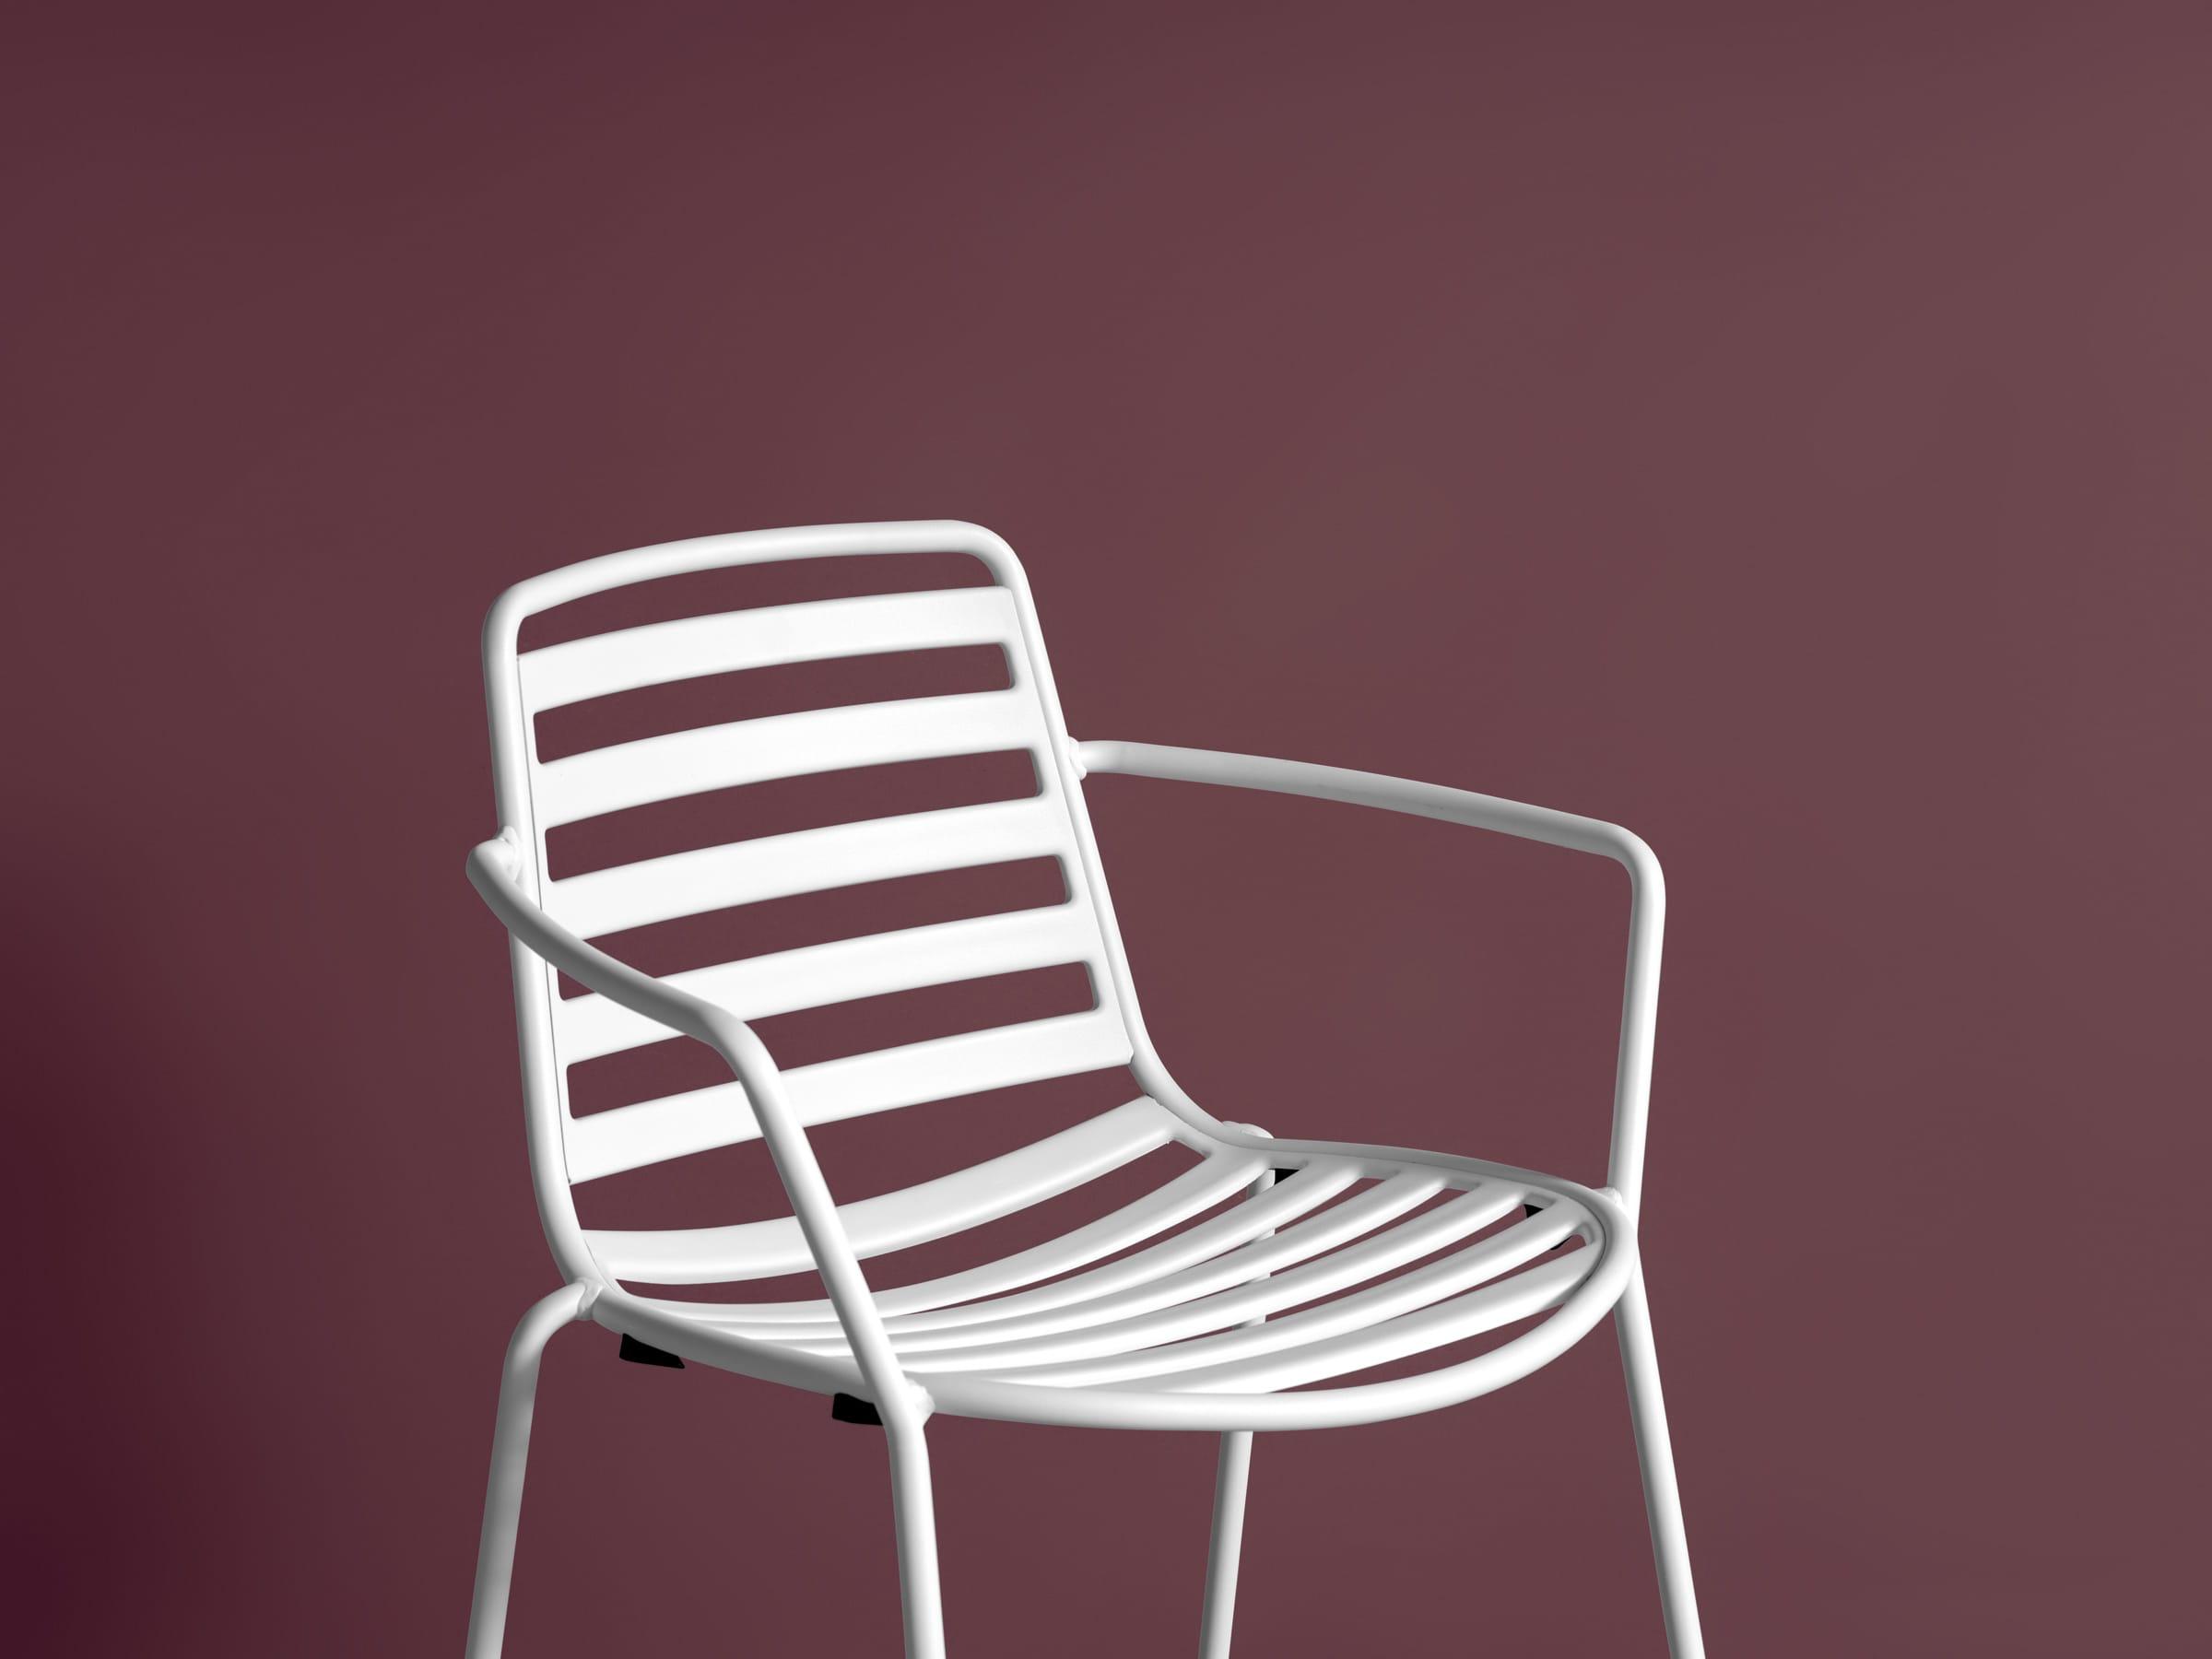 Street chair